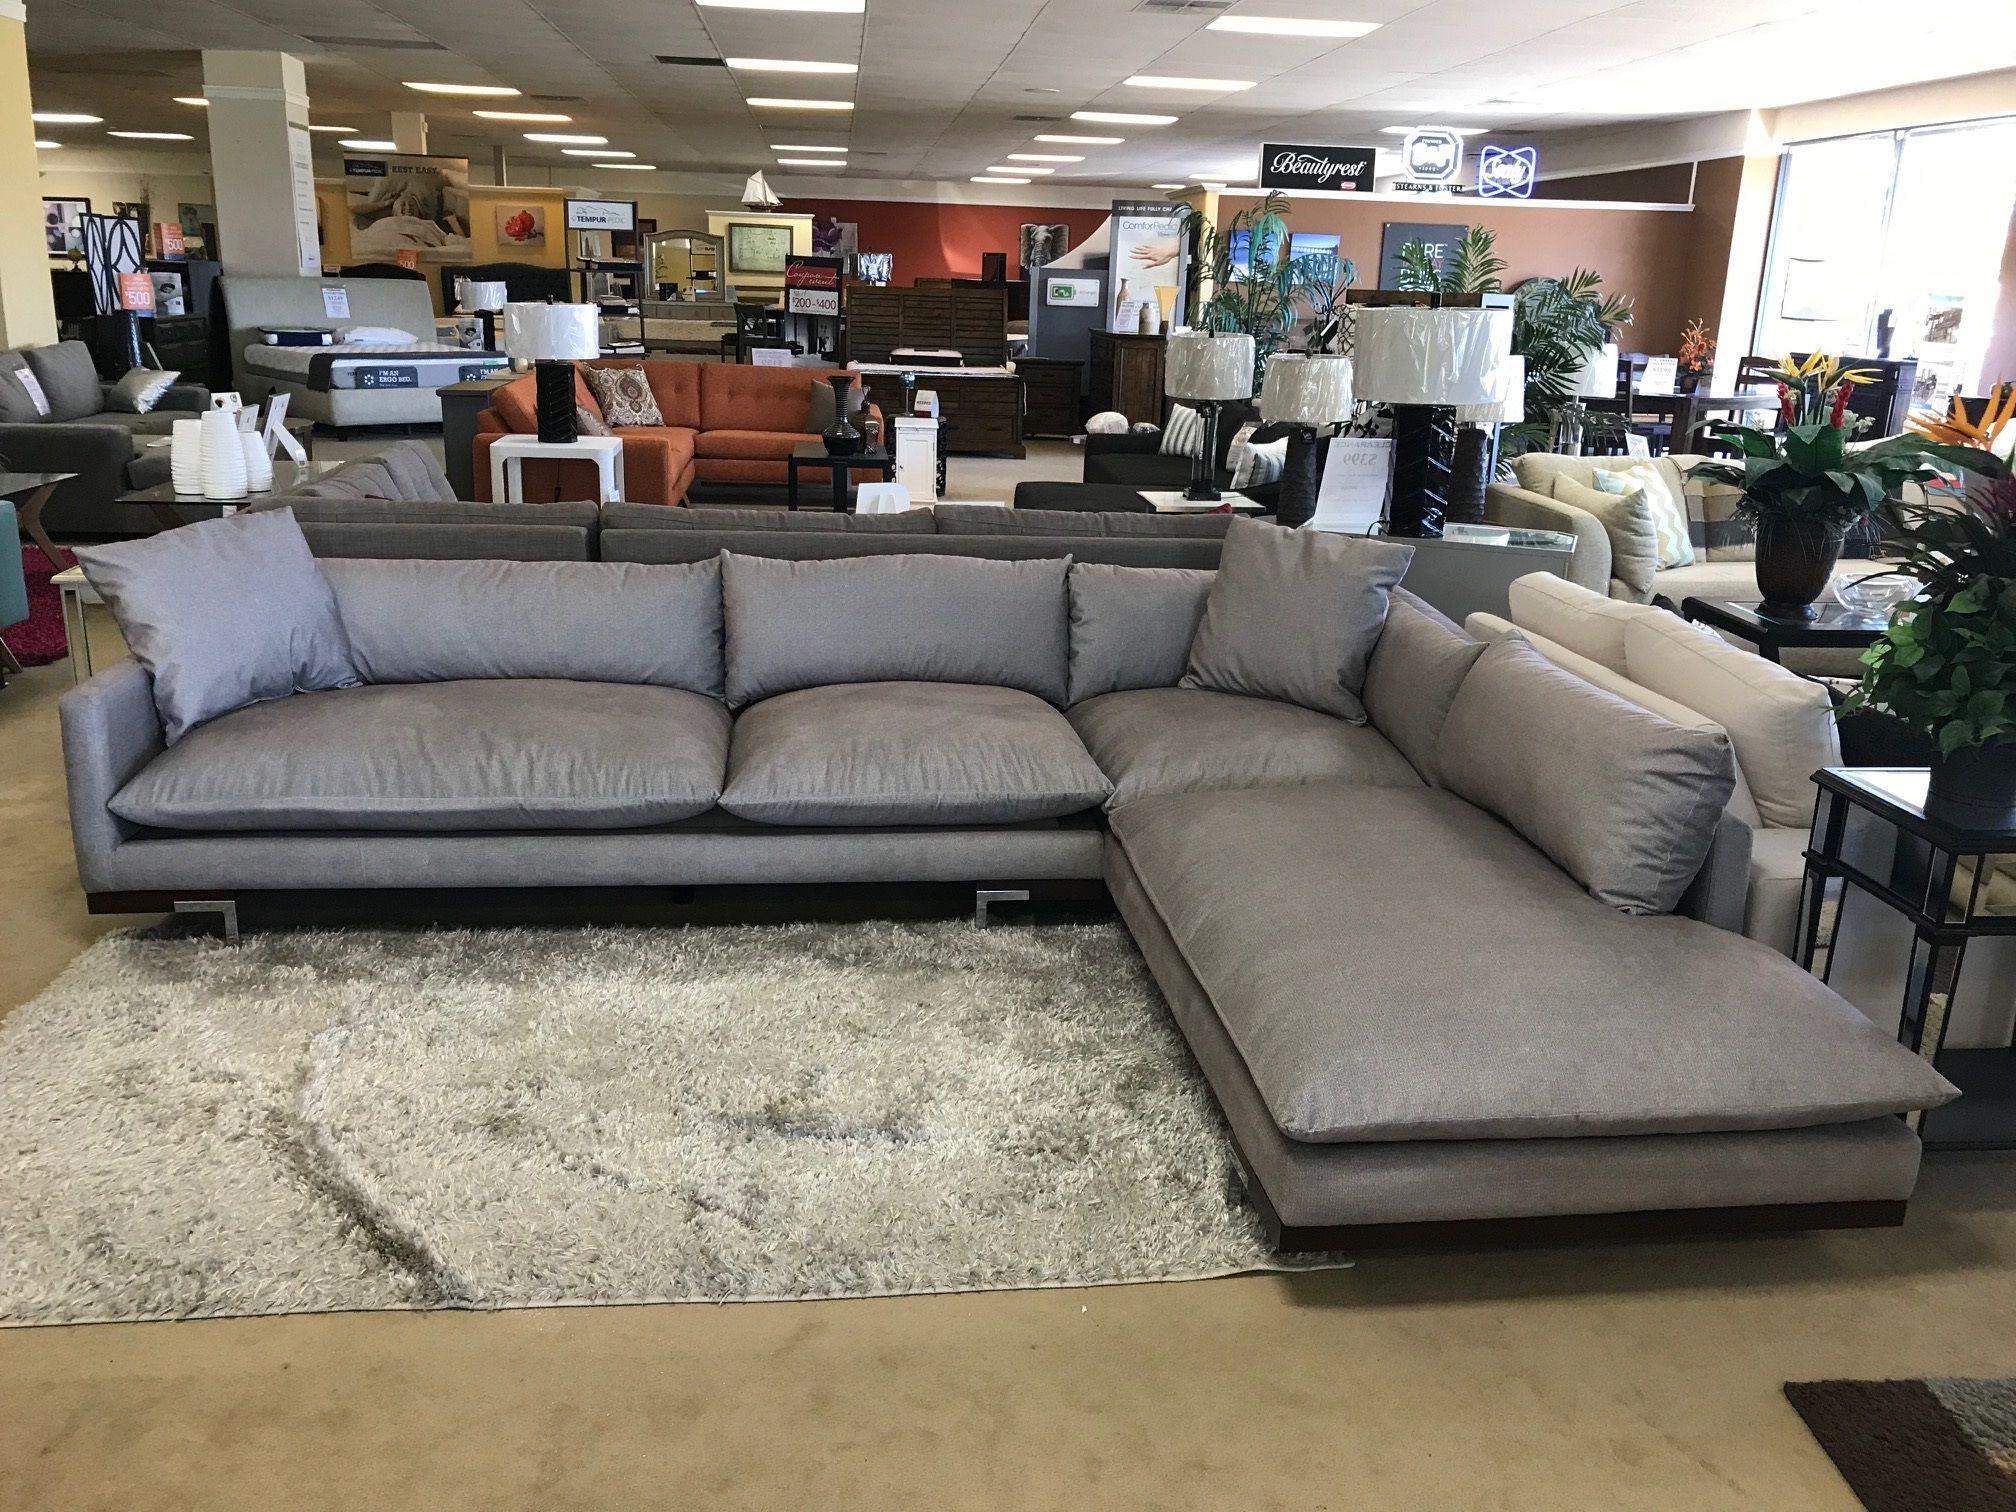 customizable sofas orange county urban innovations cerritos custom sofas los angeles made to